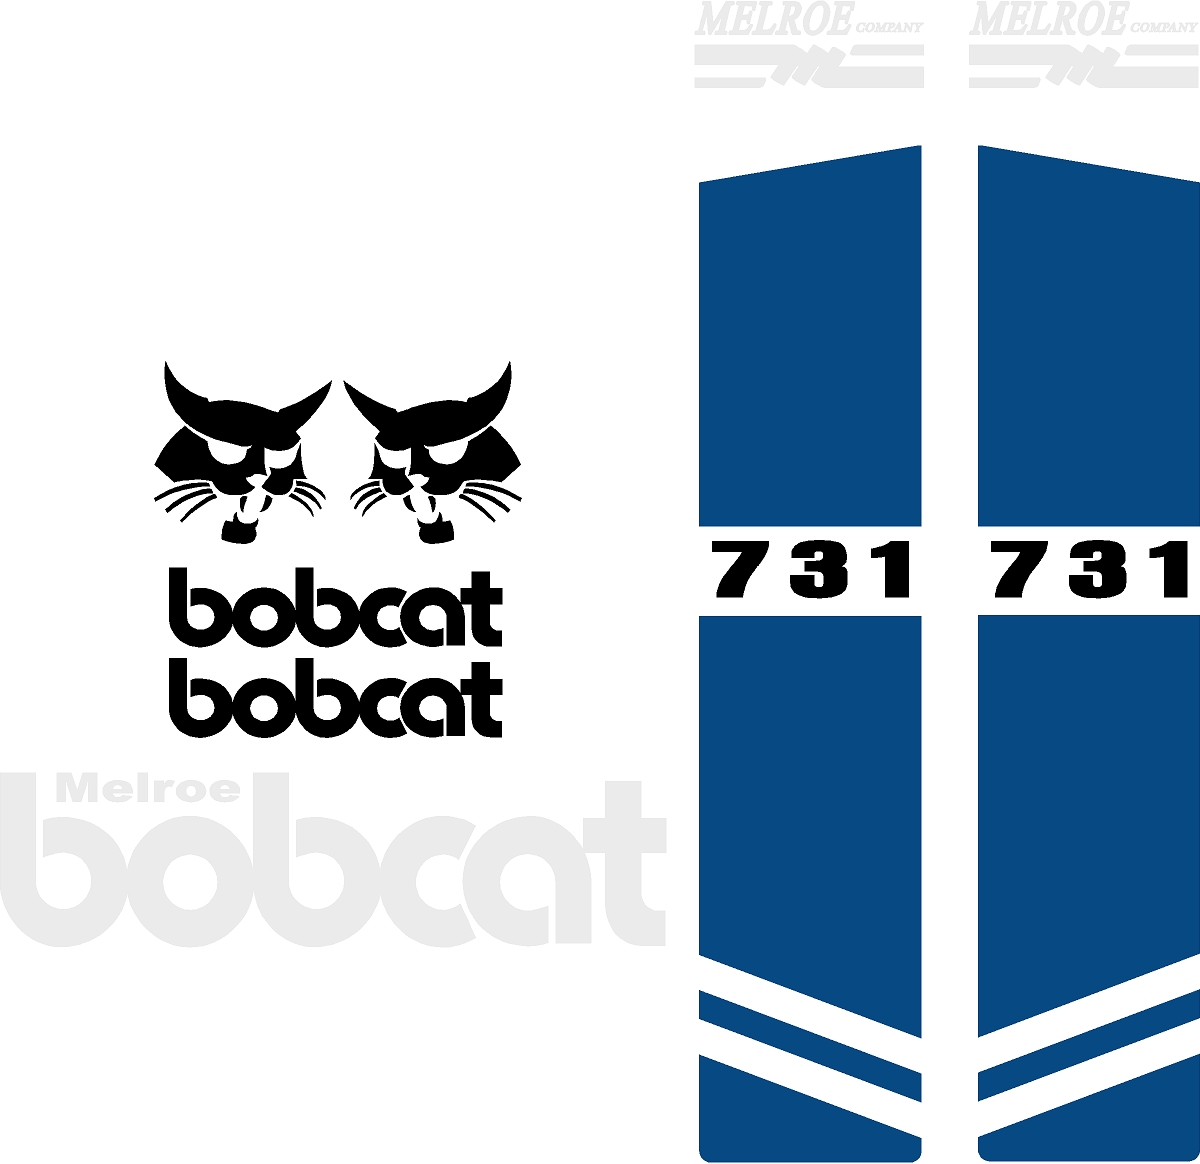 Decal Kits Product : Bobcat replacement decal kit